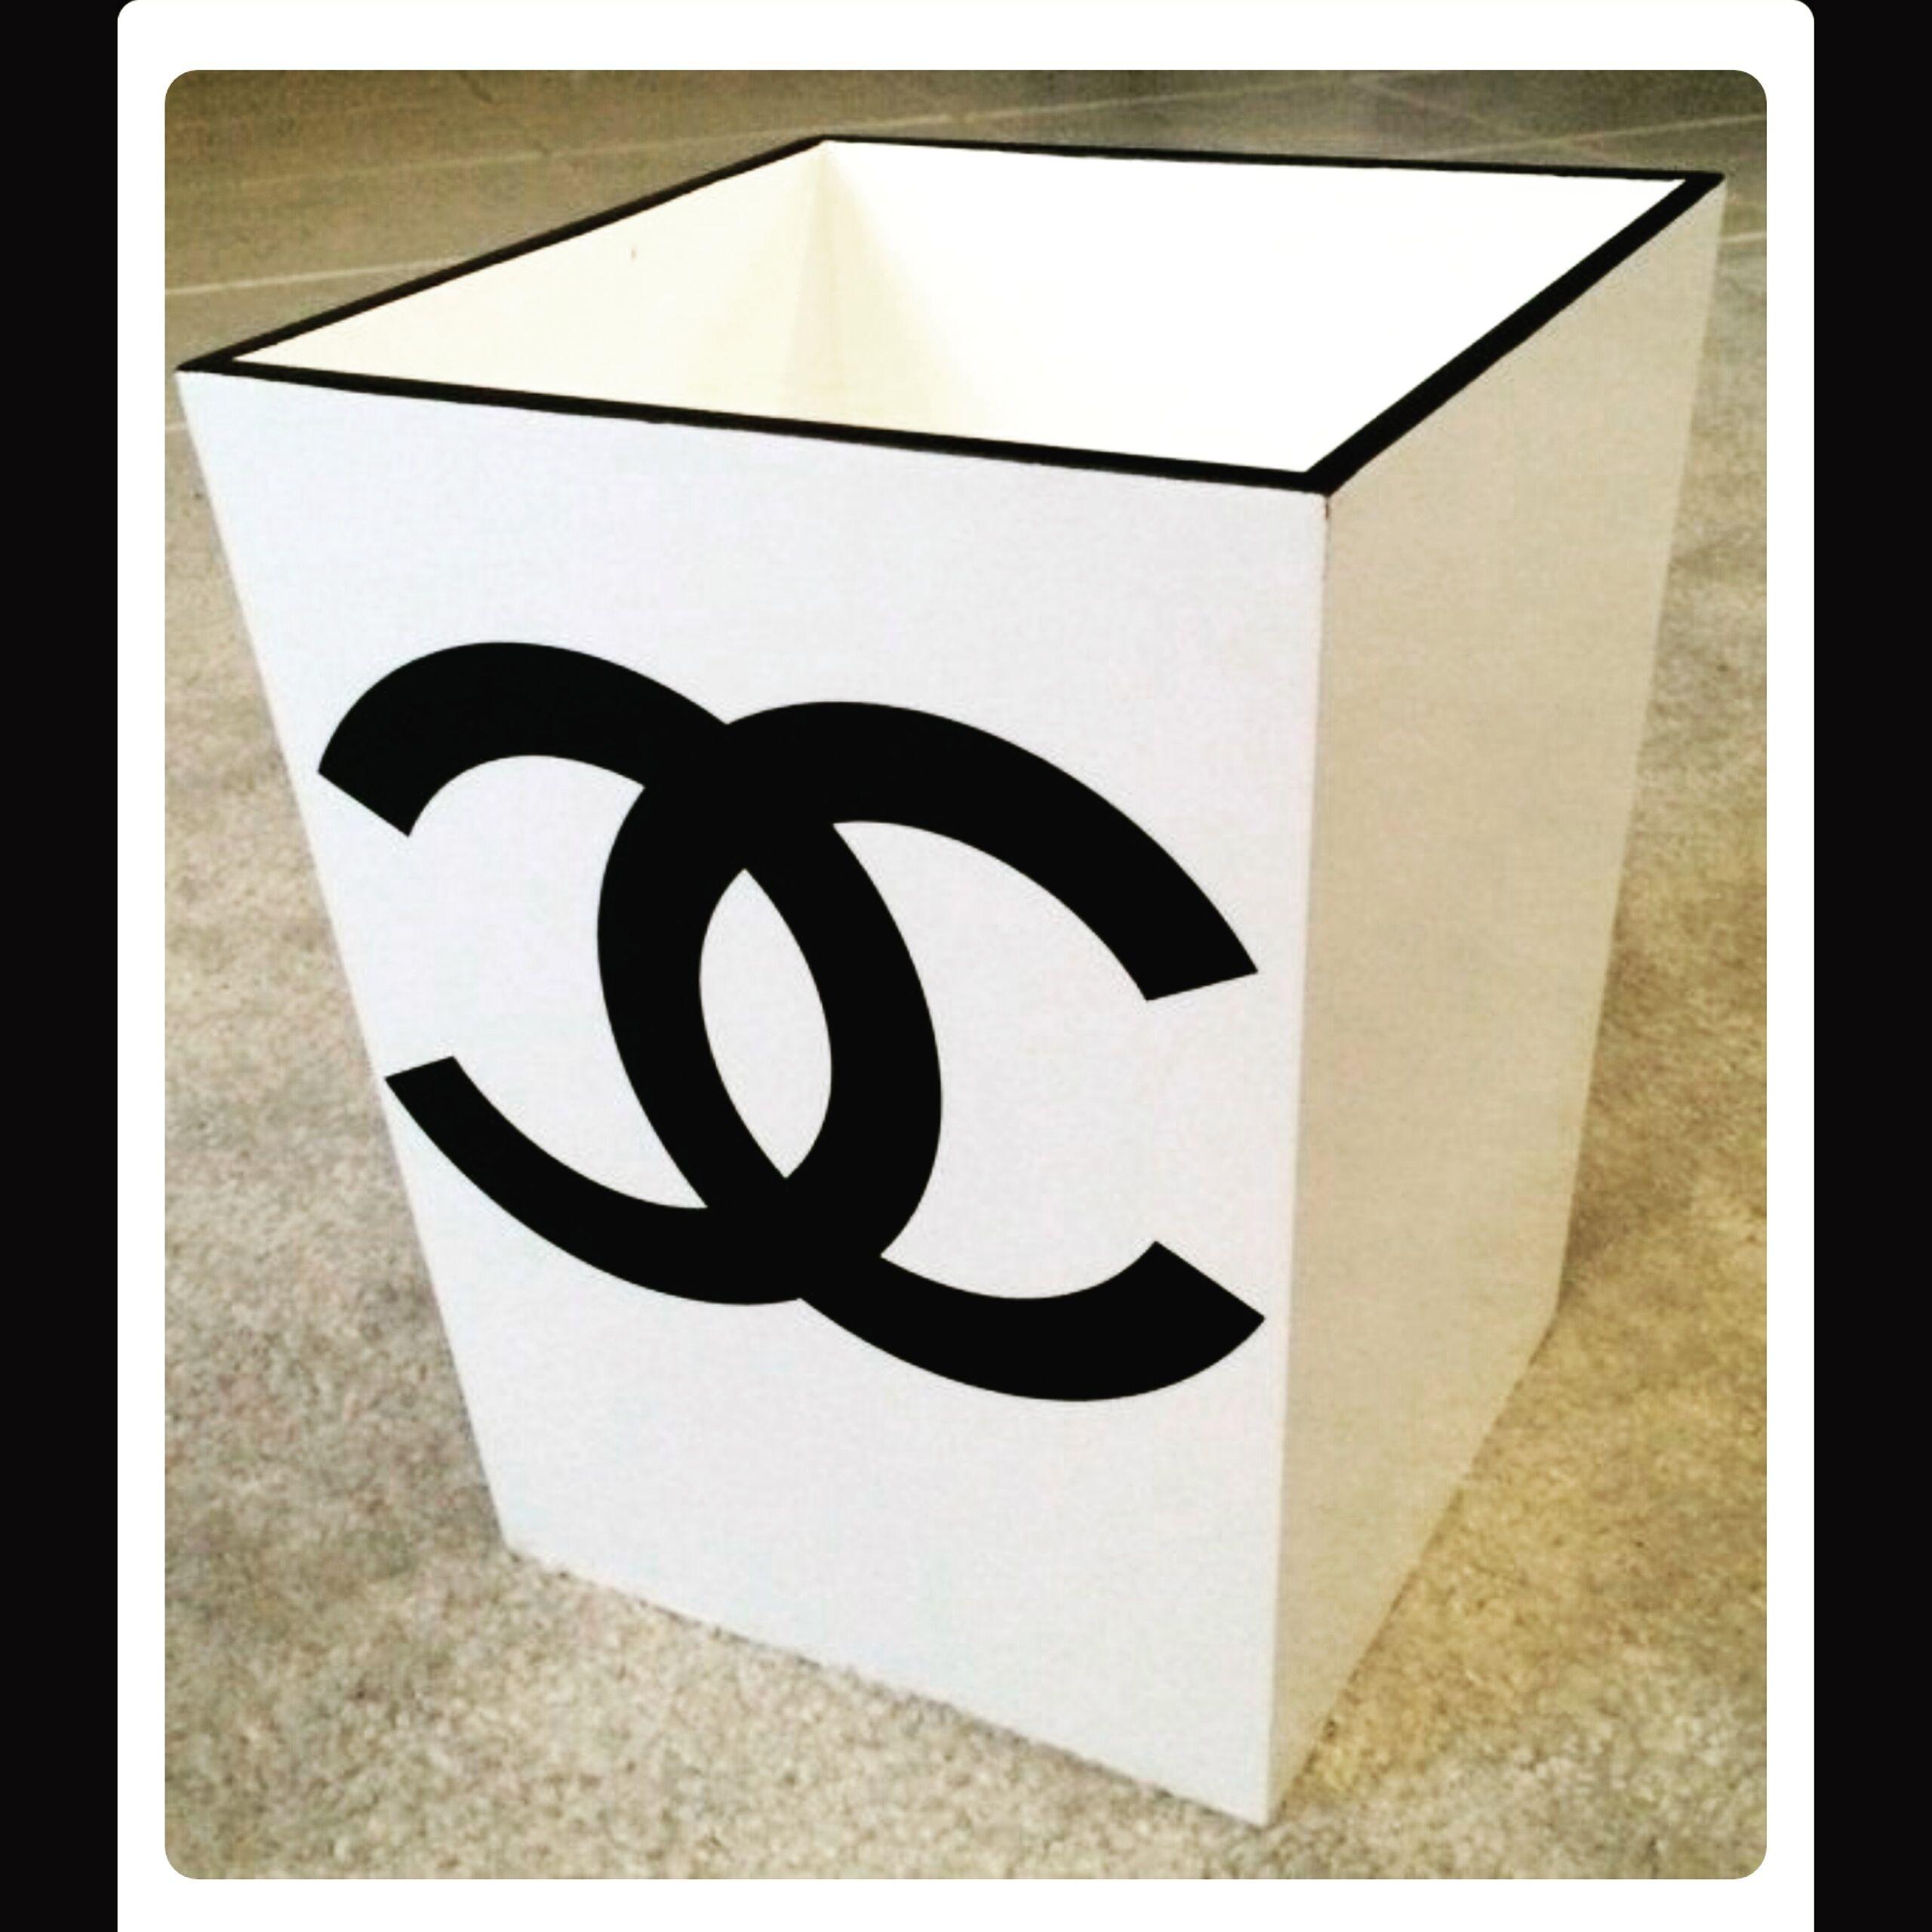 Chanel inspired trash bin white Trash Can Pinterest